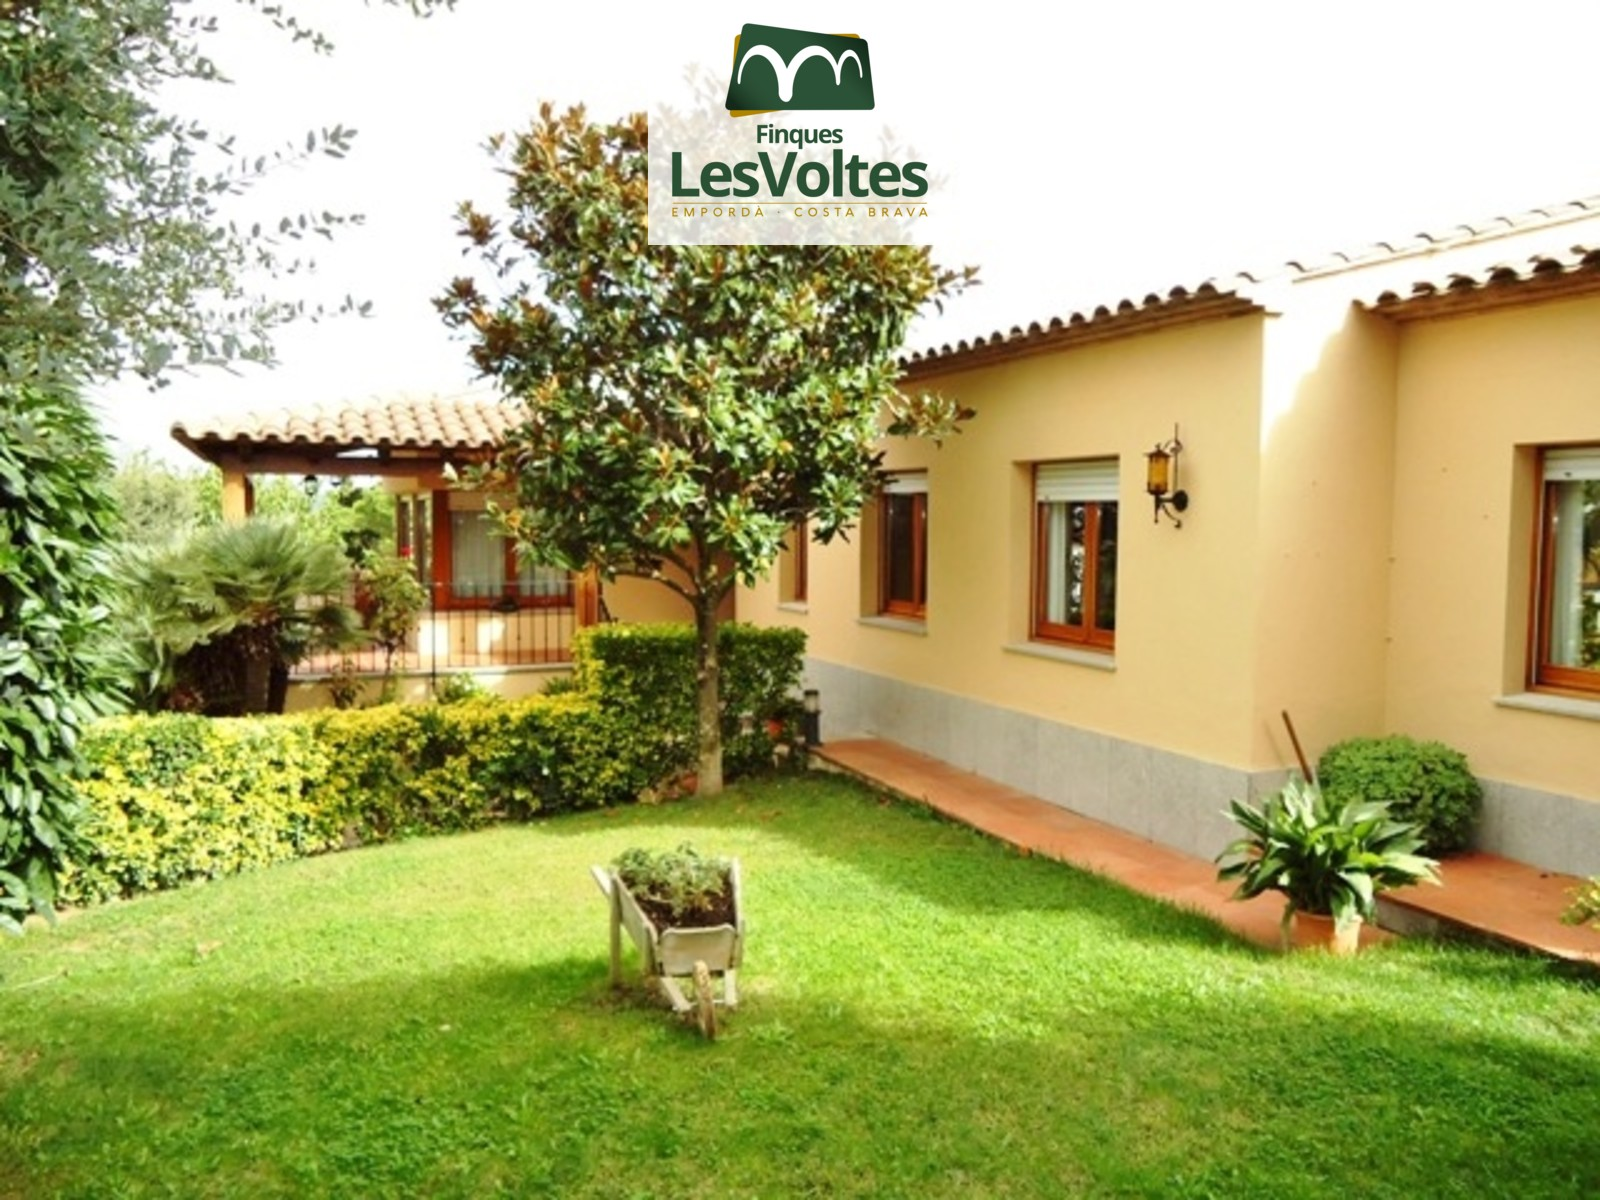 Casa unifamiliar amb jardí en venda a Palafrugell. Magnífica zona